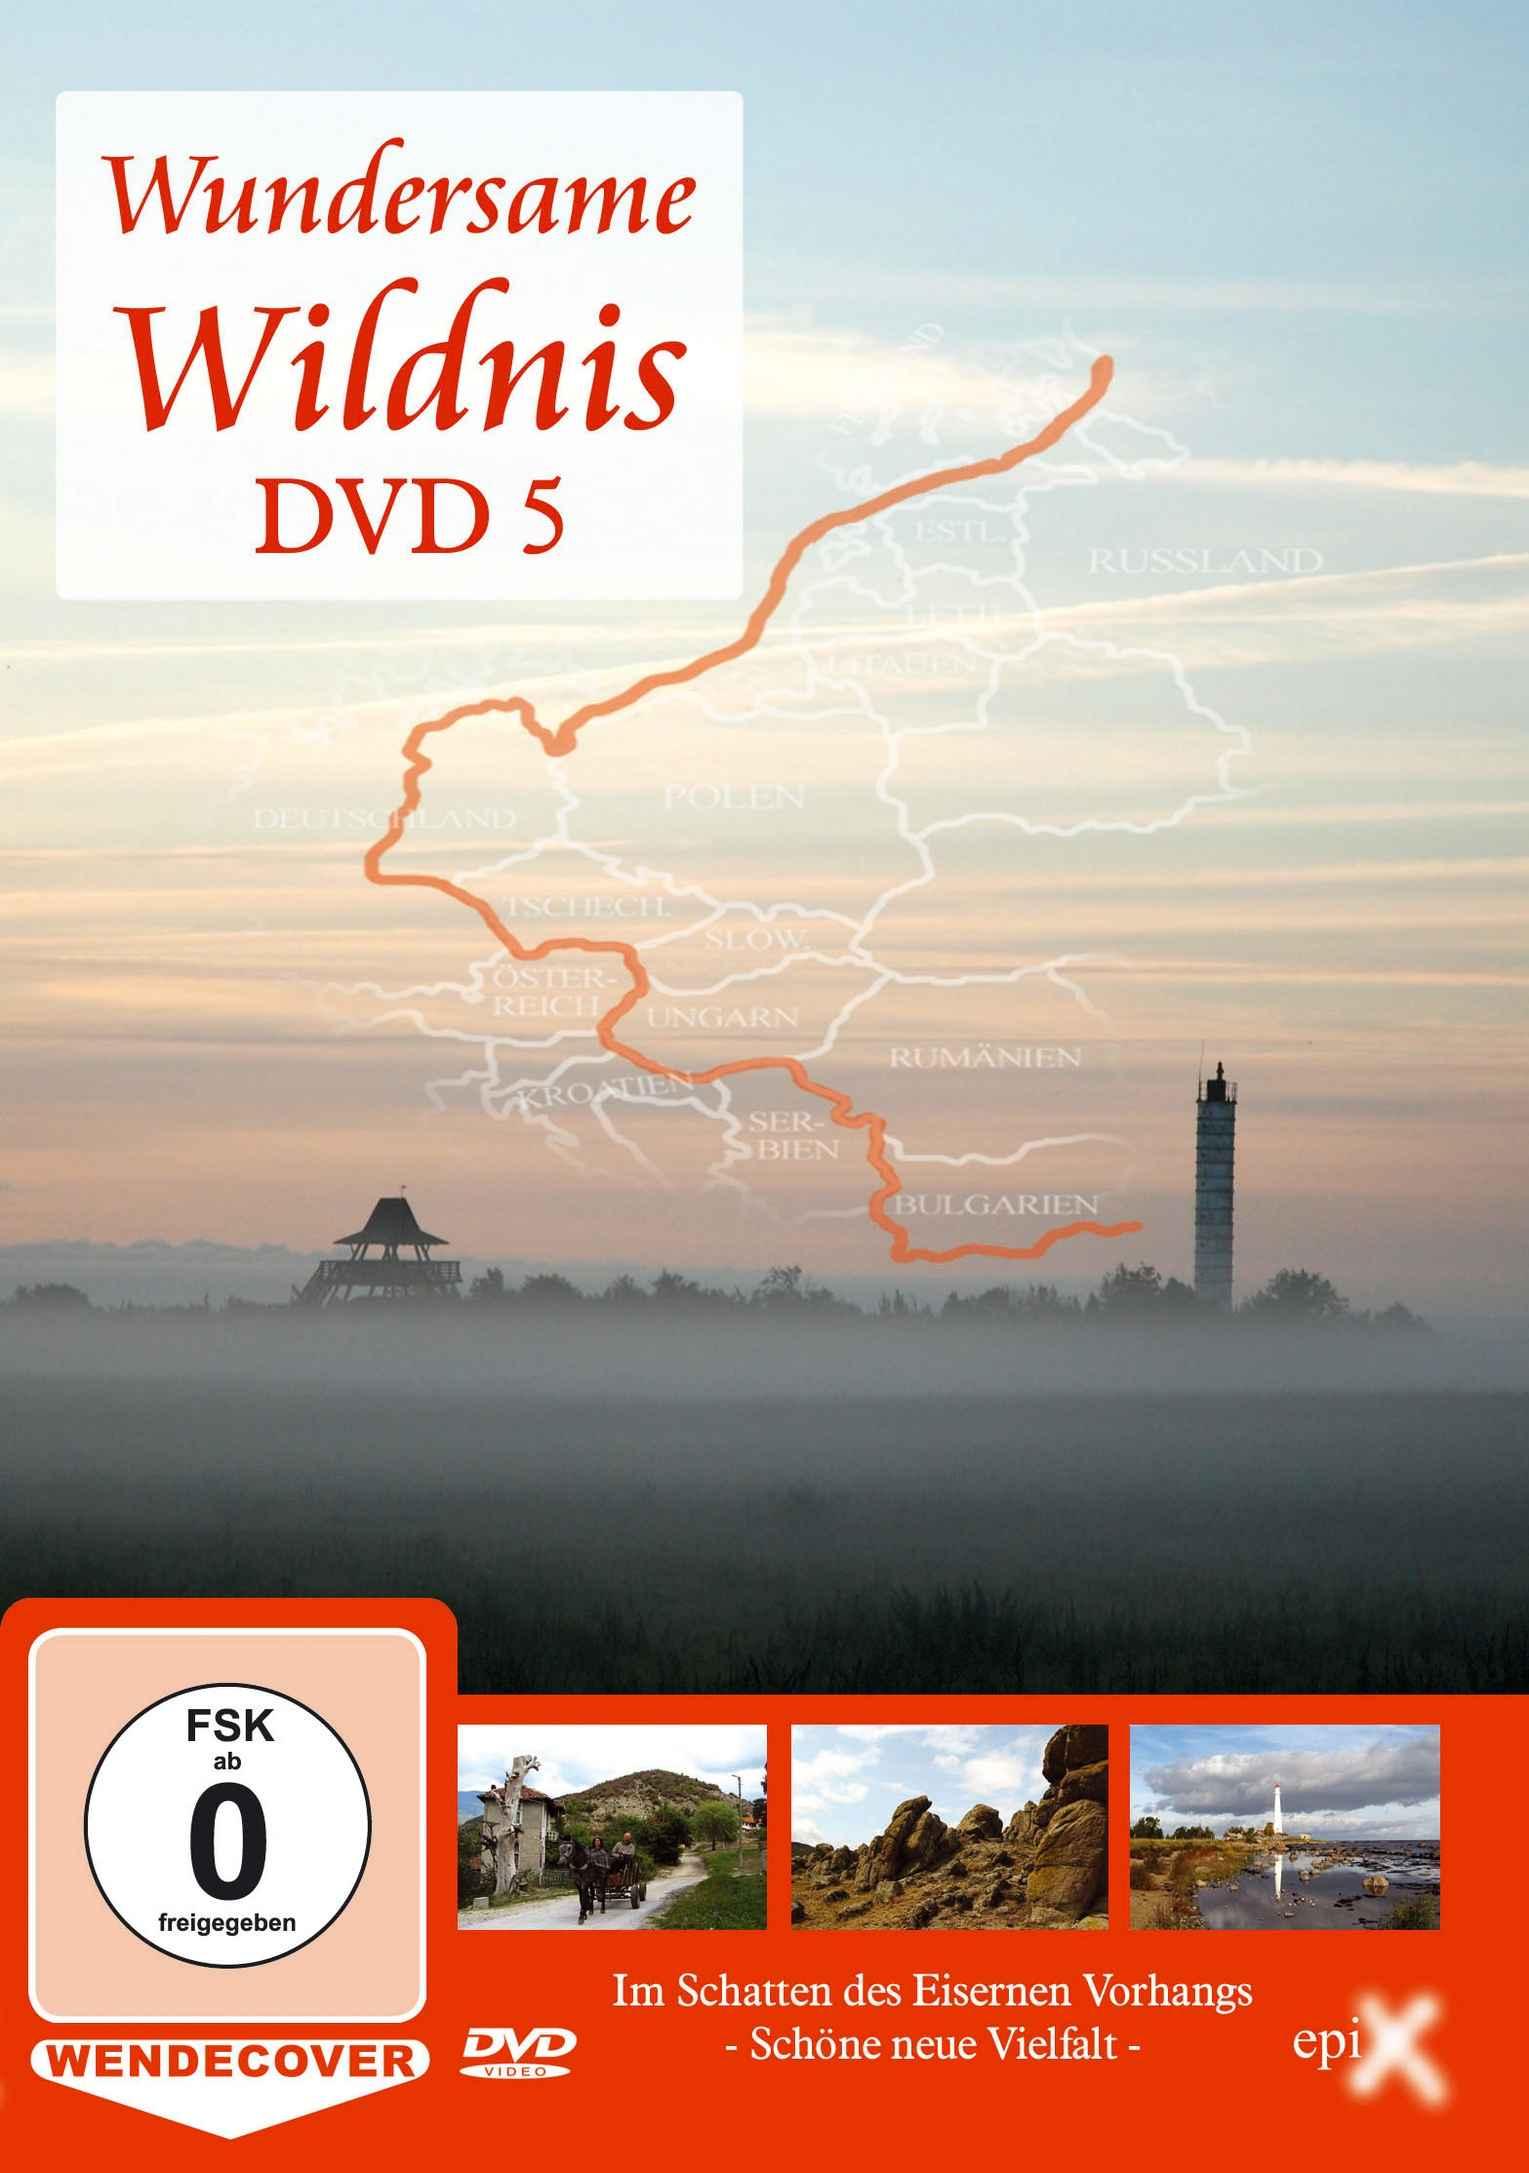 WUNDERSAME WILDNIS DVD 5 Front FINAL